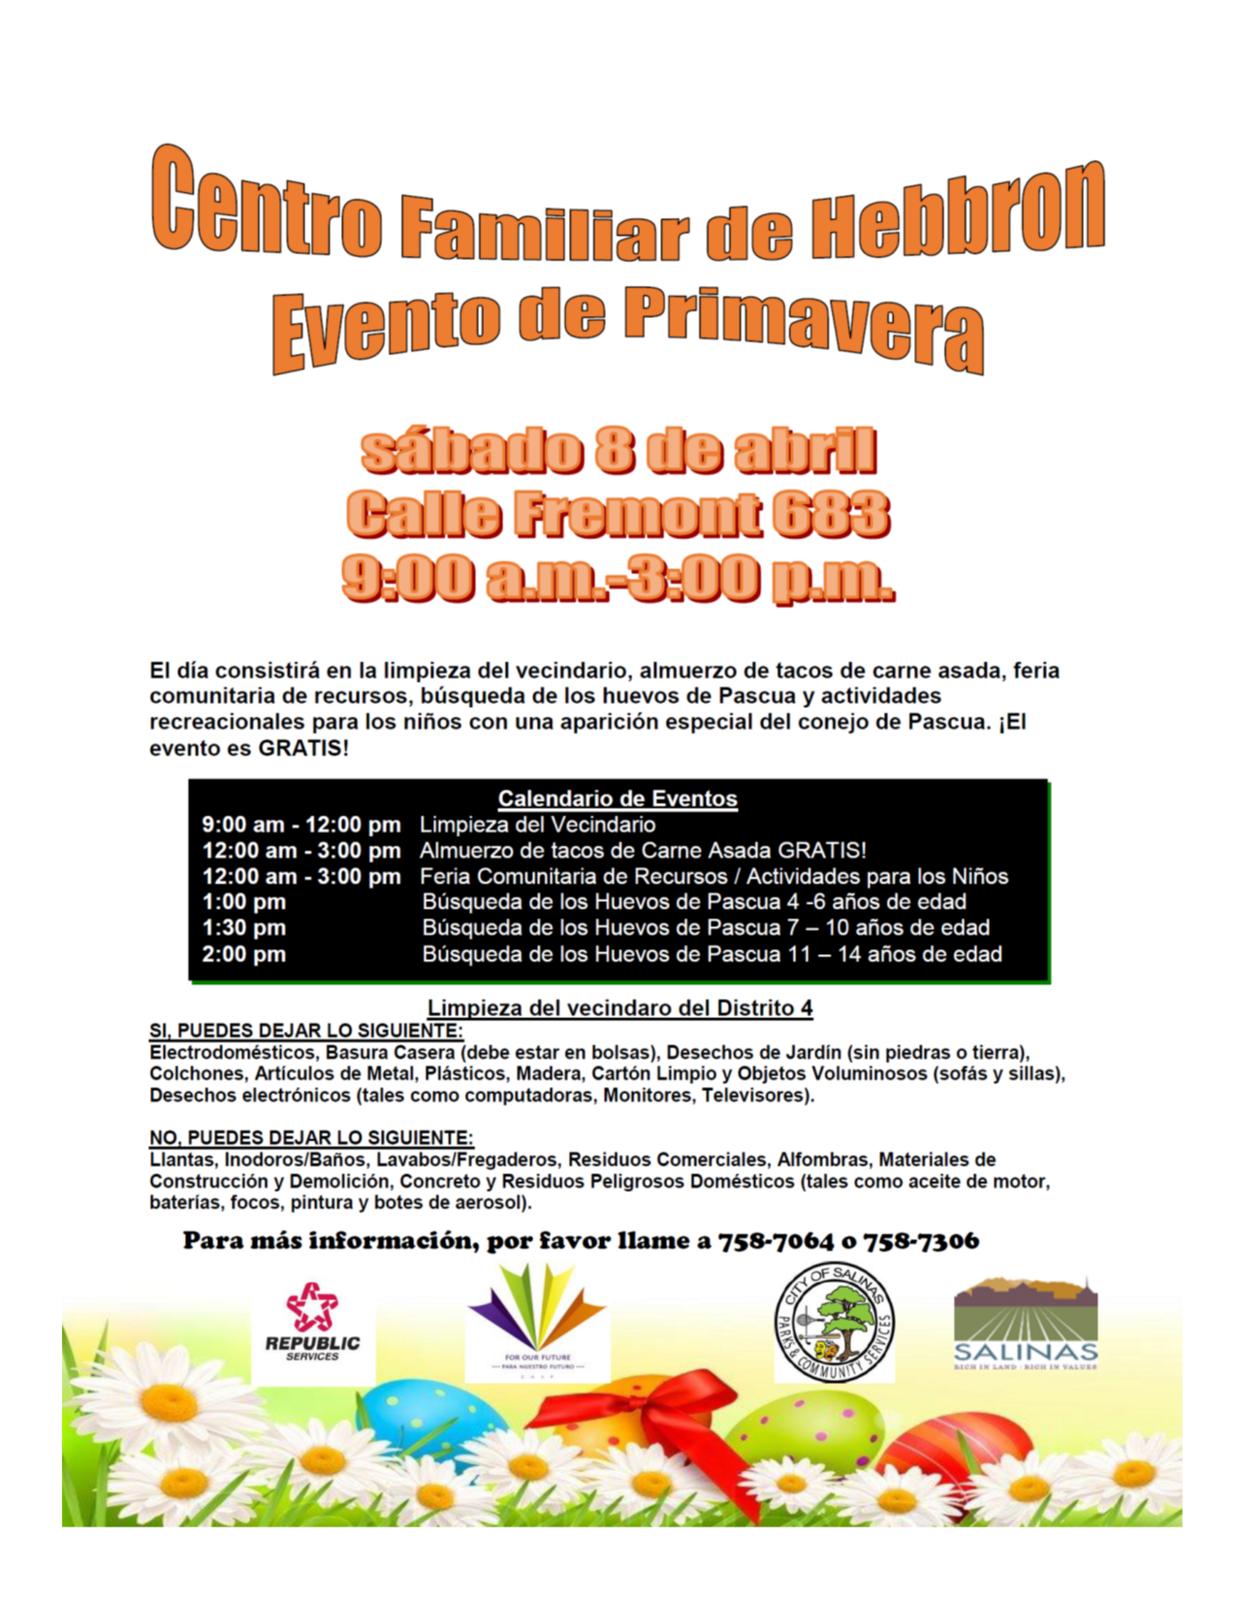 district 4 neighborhood clean up hebbron family center spring event city of salinas nextdoor electrodomesticos - Electrodomesticos Pascua